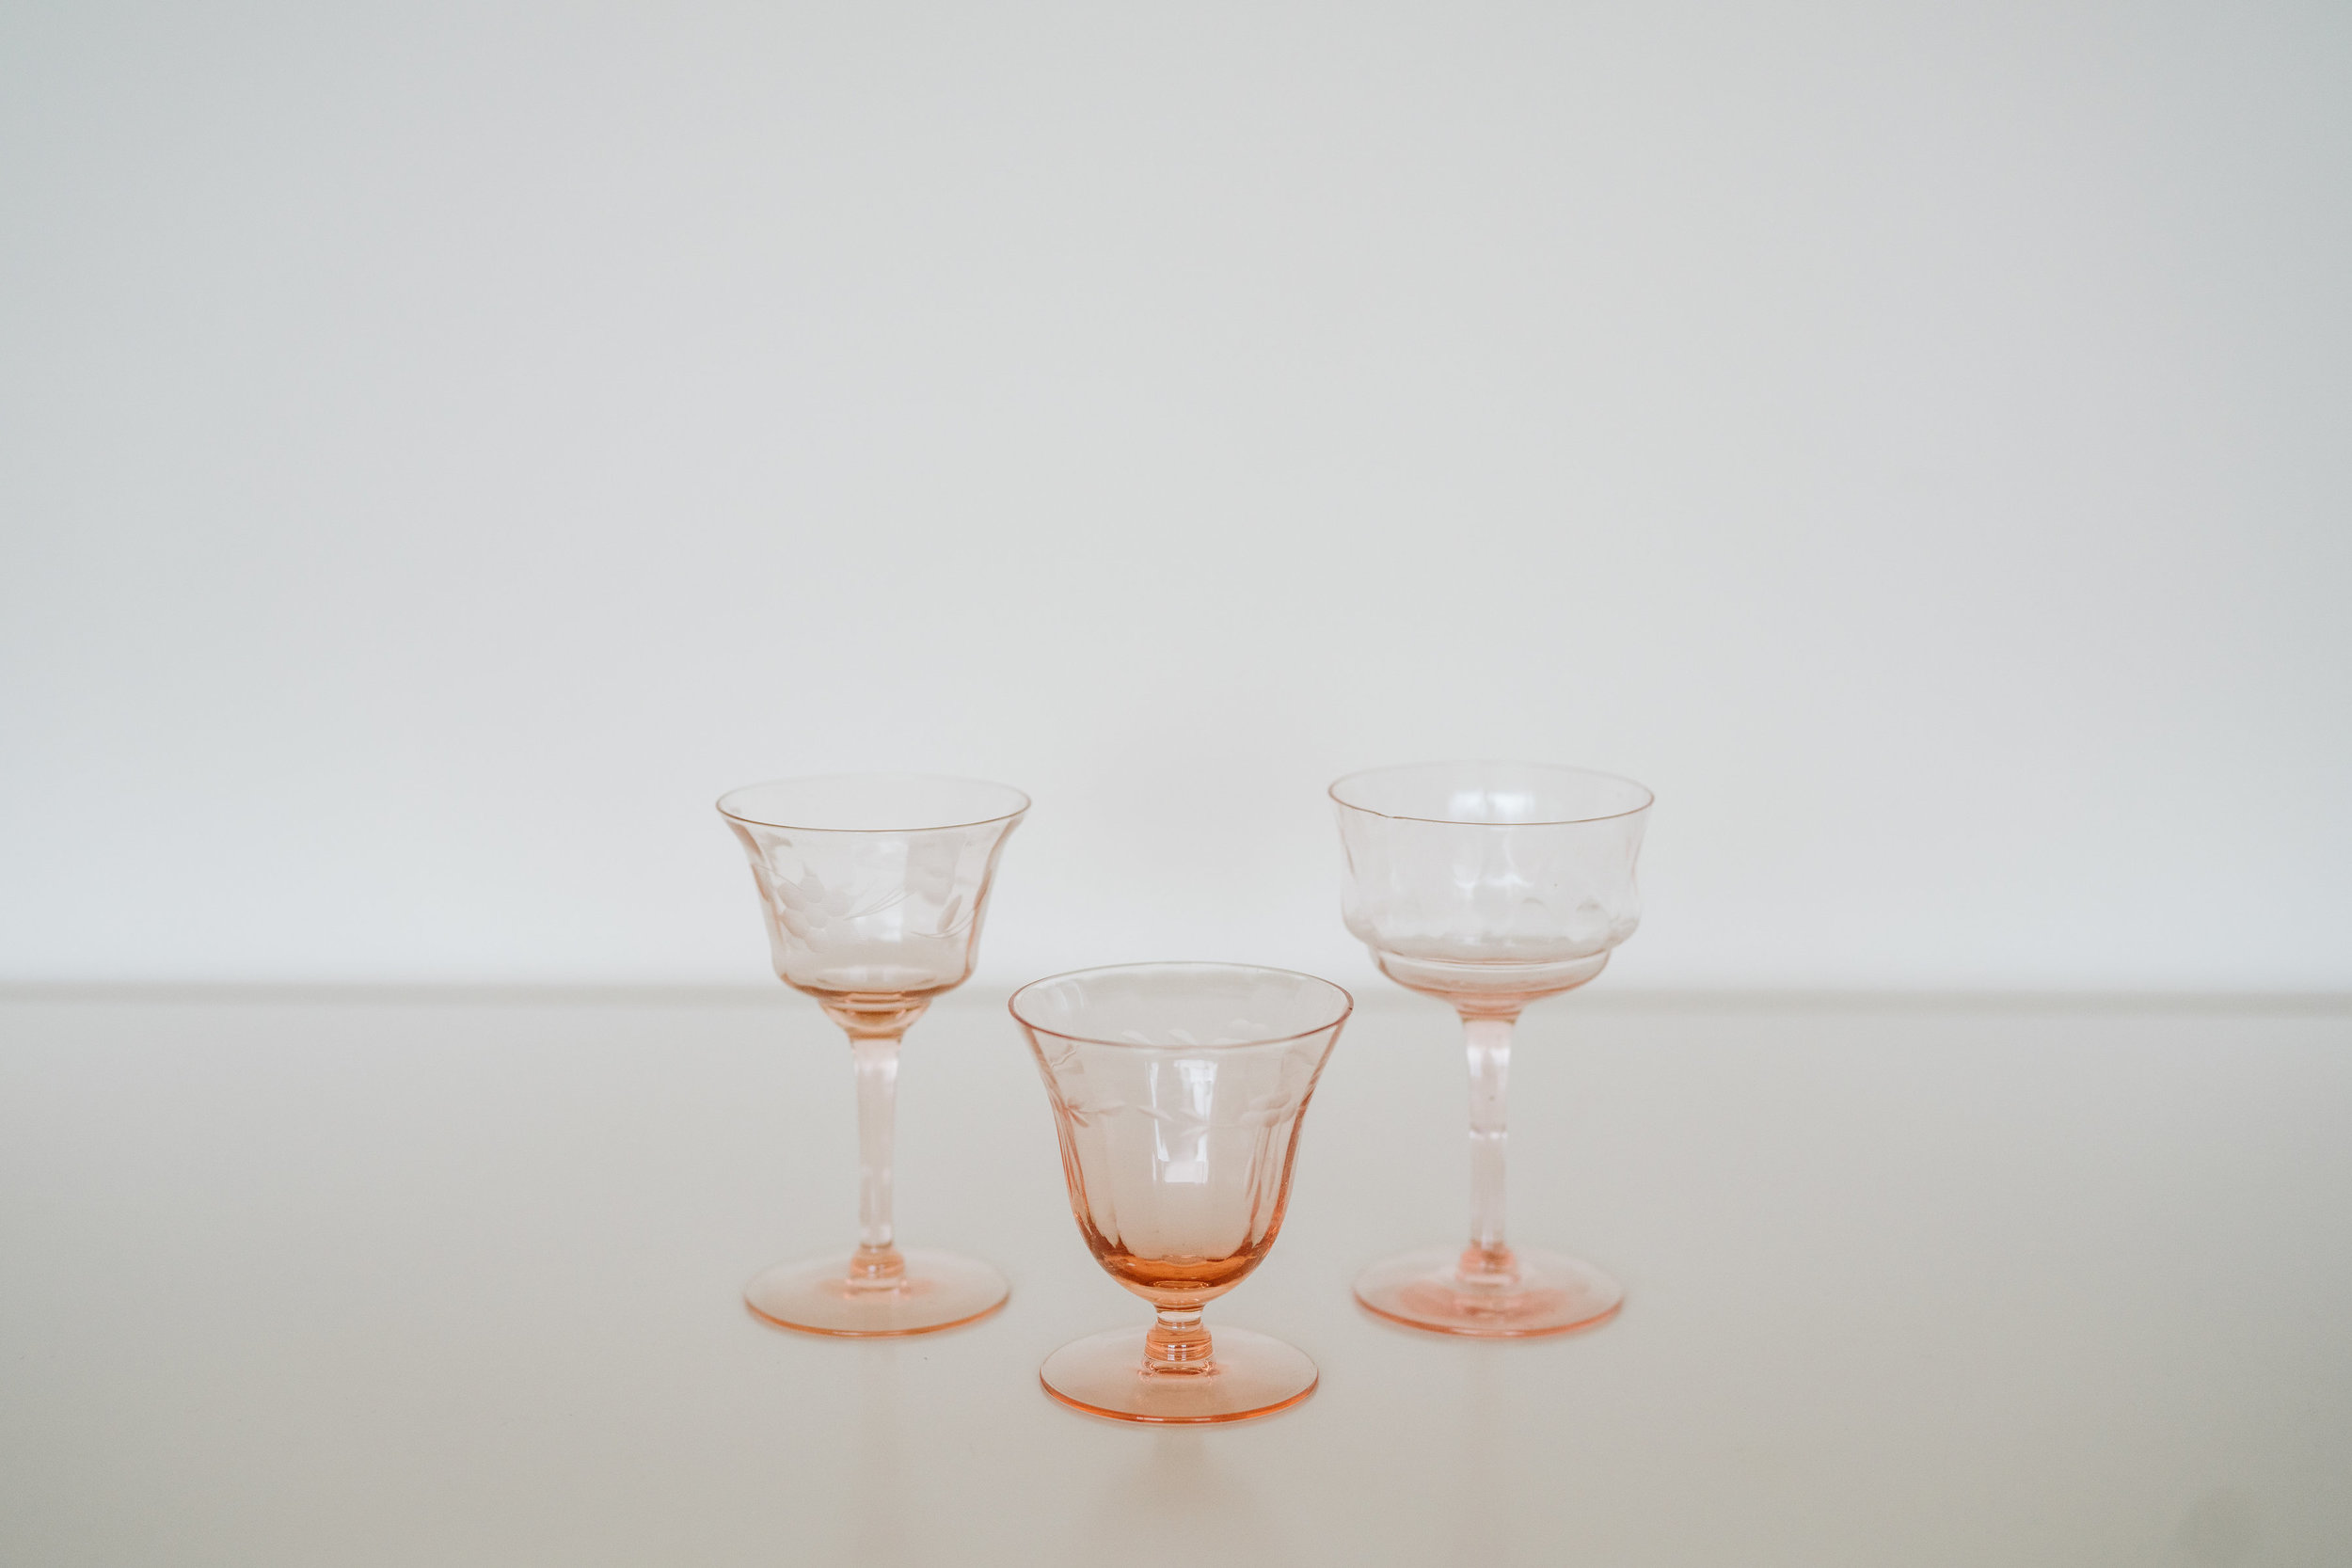 BLUSH DEPRESSION CORDIAL GLASSES